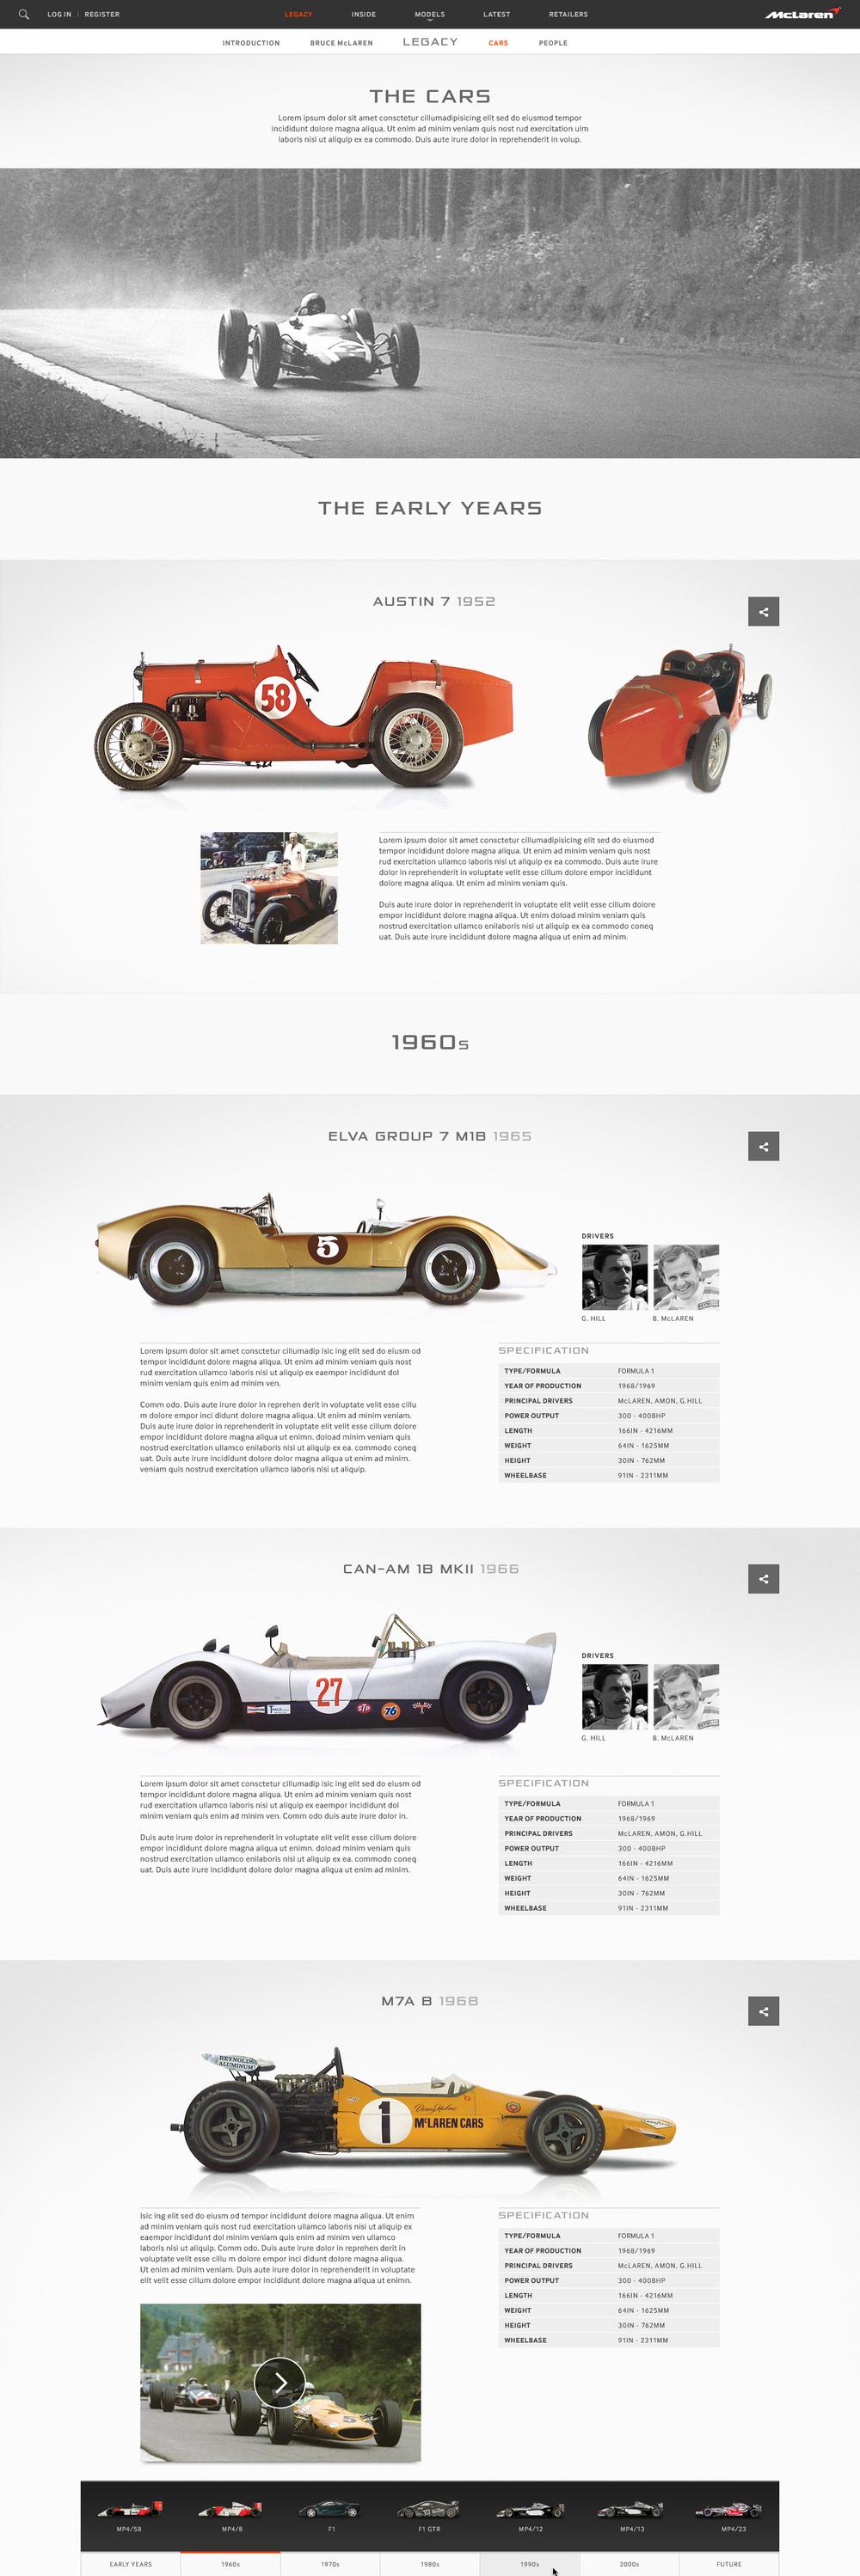 McLaren_Legacy_Cars_5_Gallery-crop.jpg